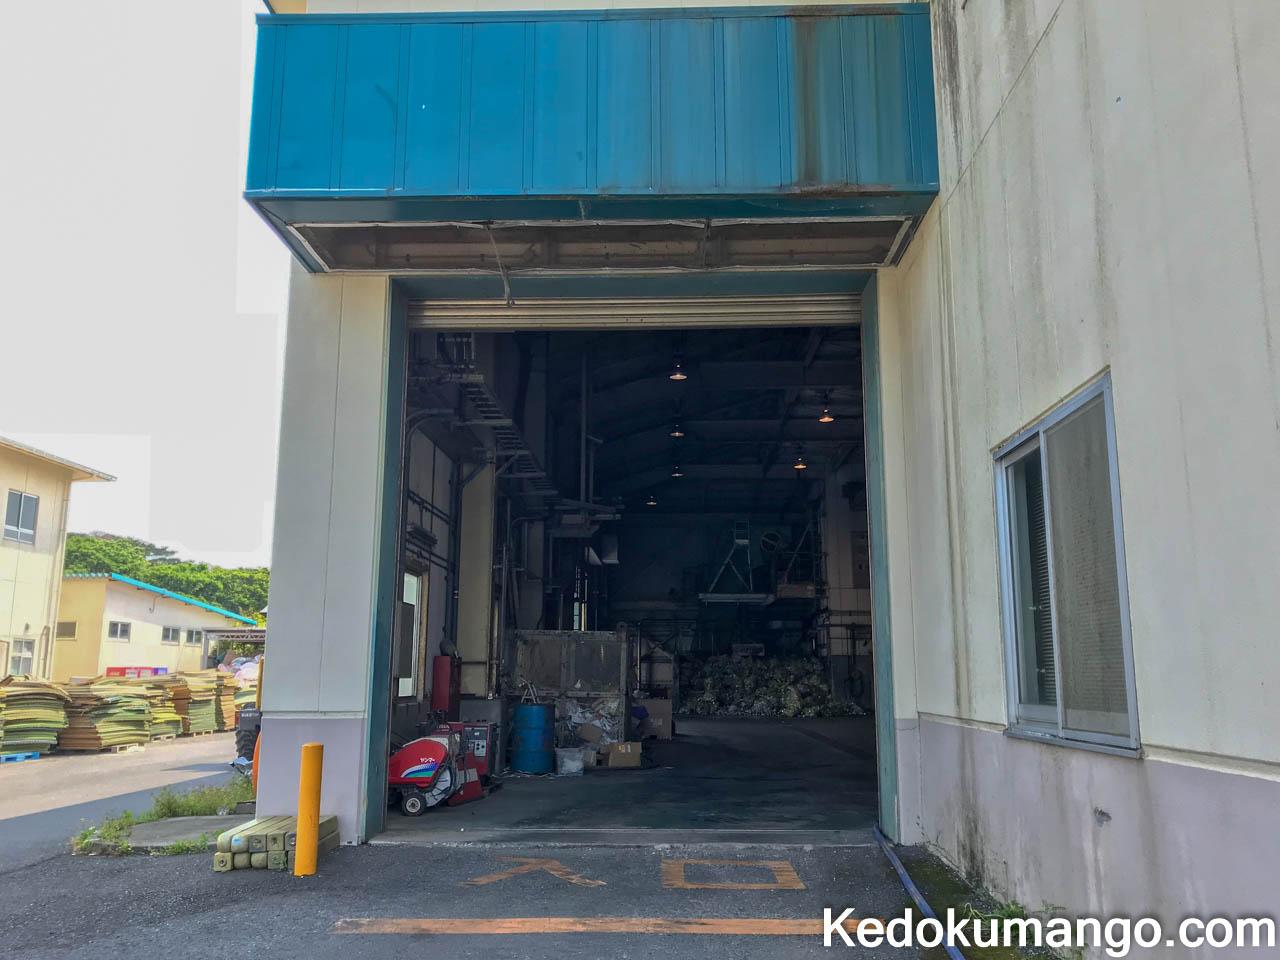 処分場建物の入口